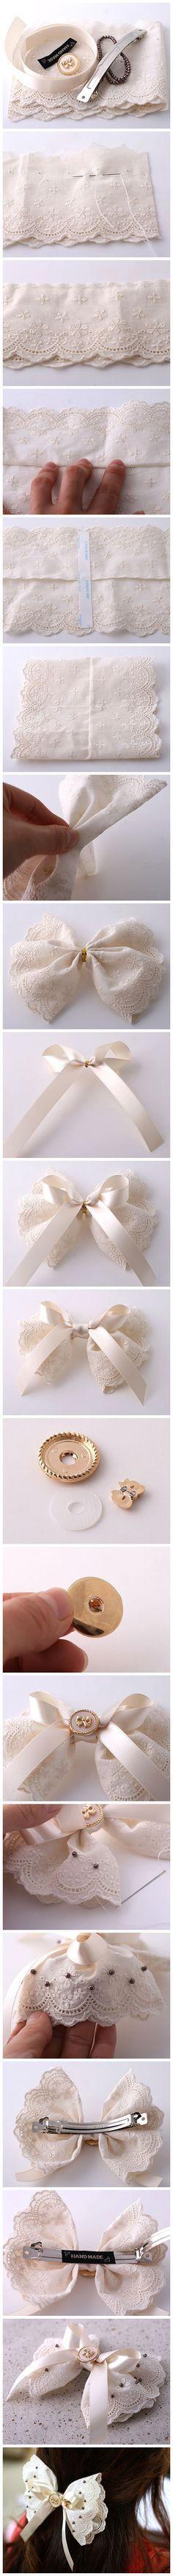 DIY Cute Bow: